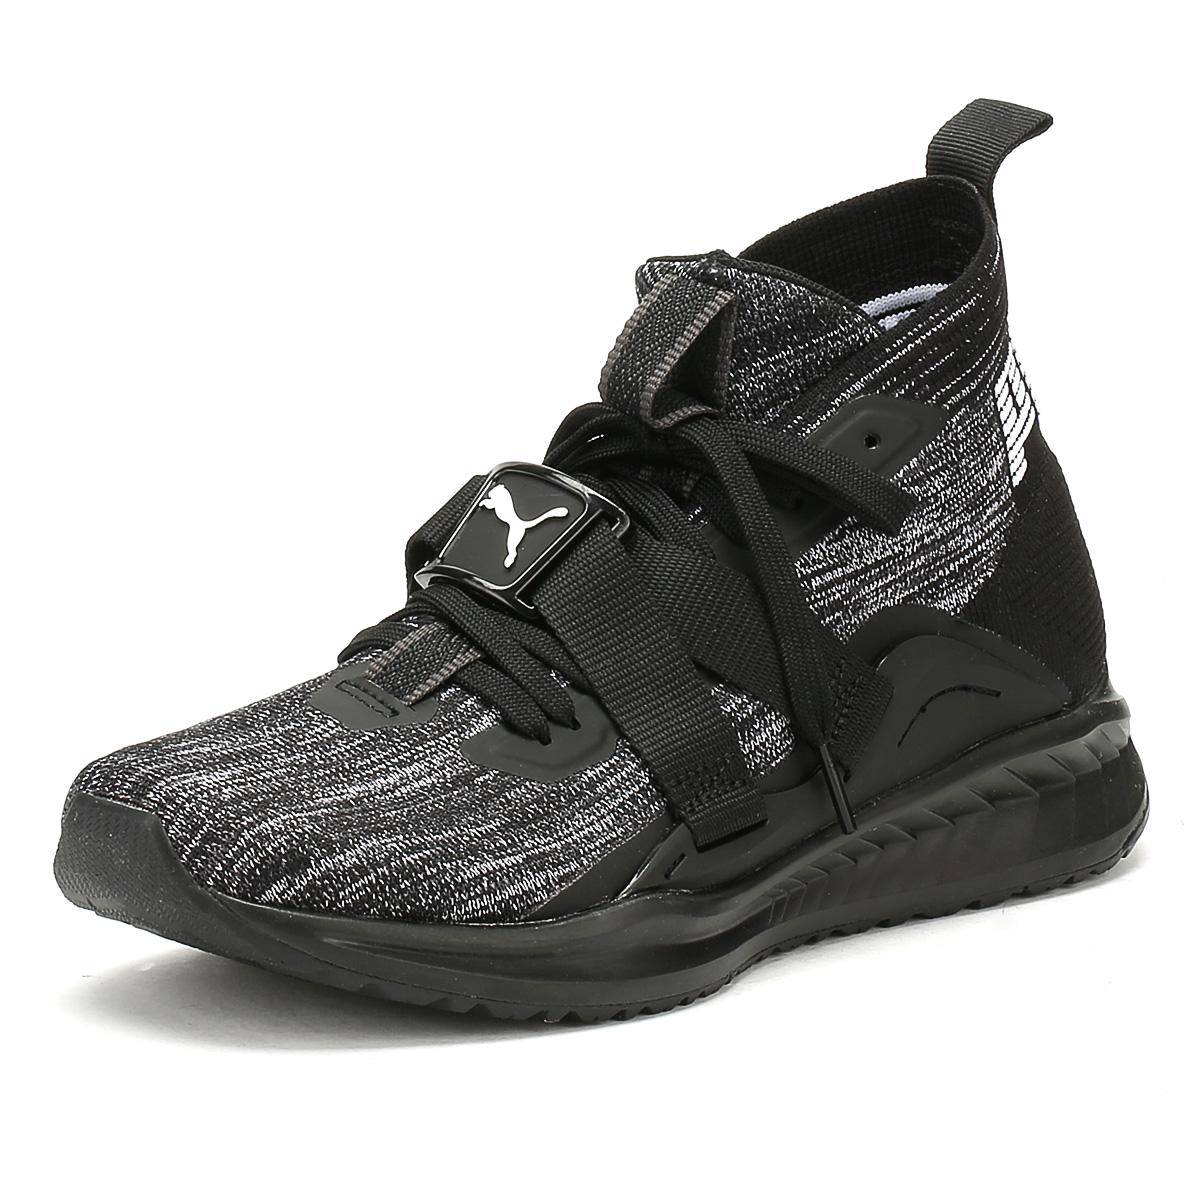 Puma Homme noir Chaussures Ignite evoknit 2 Baskets Chaussures noir De Loisirs Hi High Tops- 875359